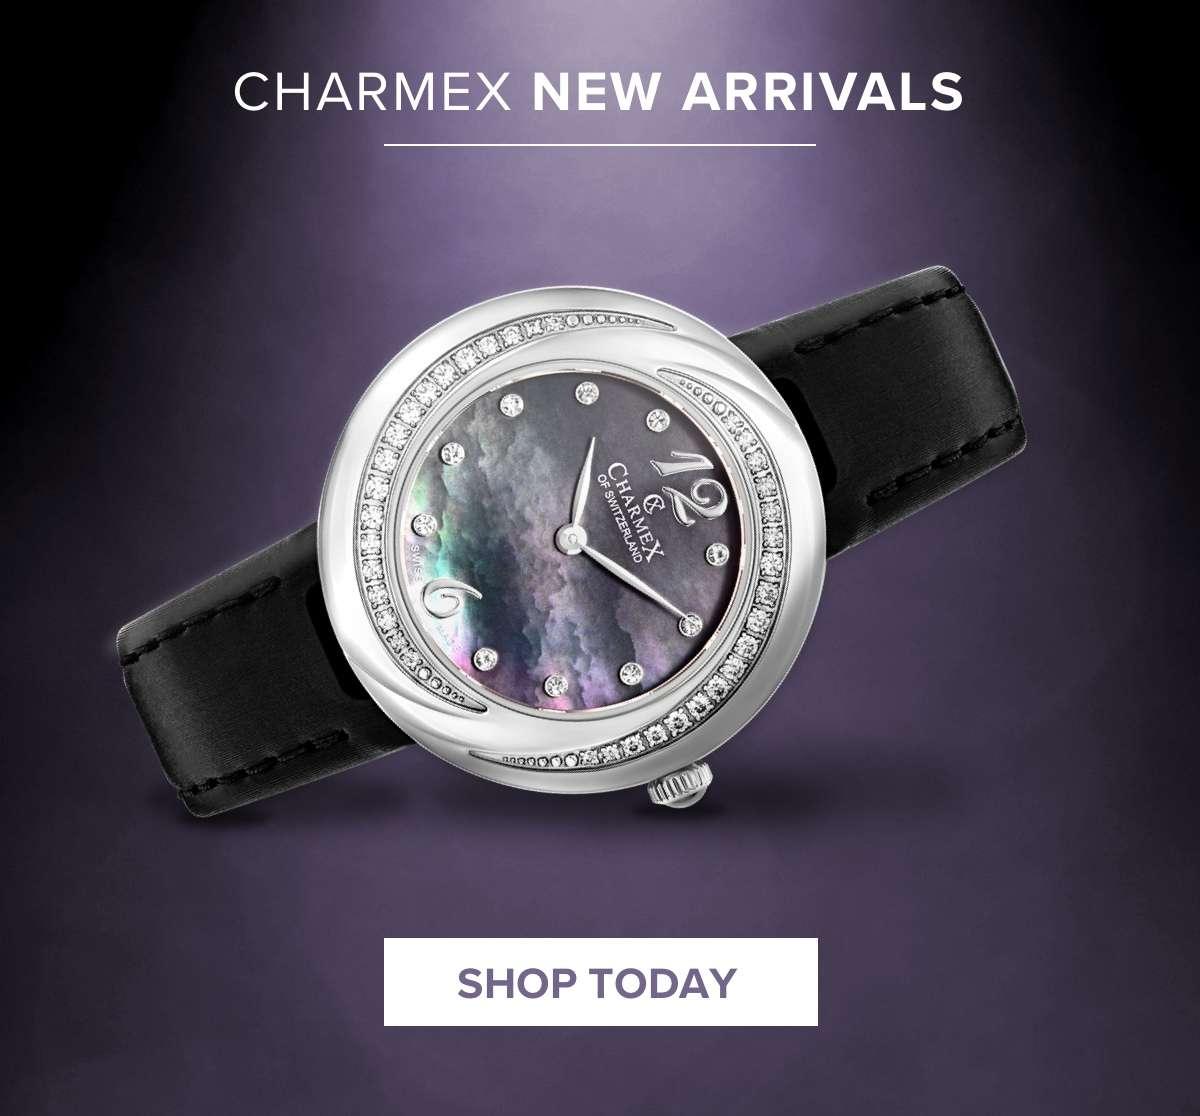 Charmex new arrivals